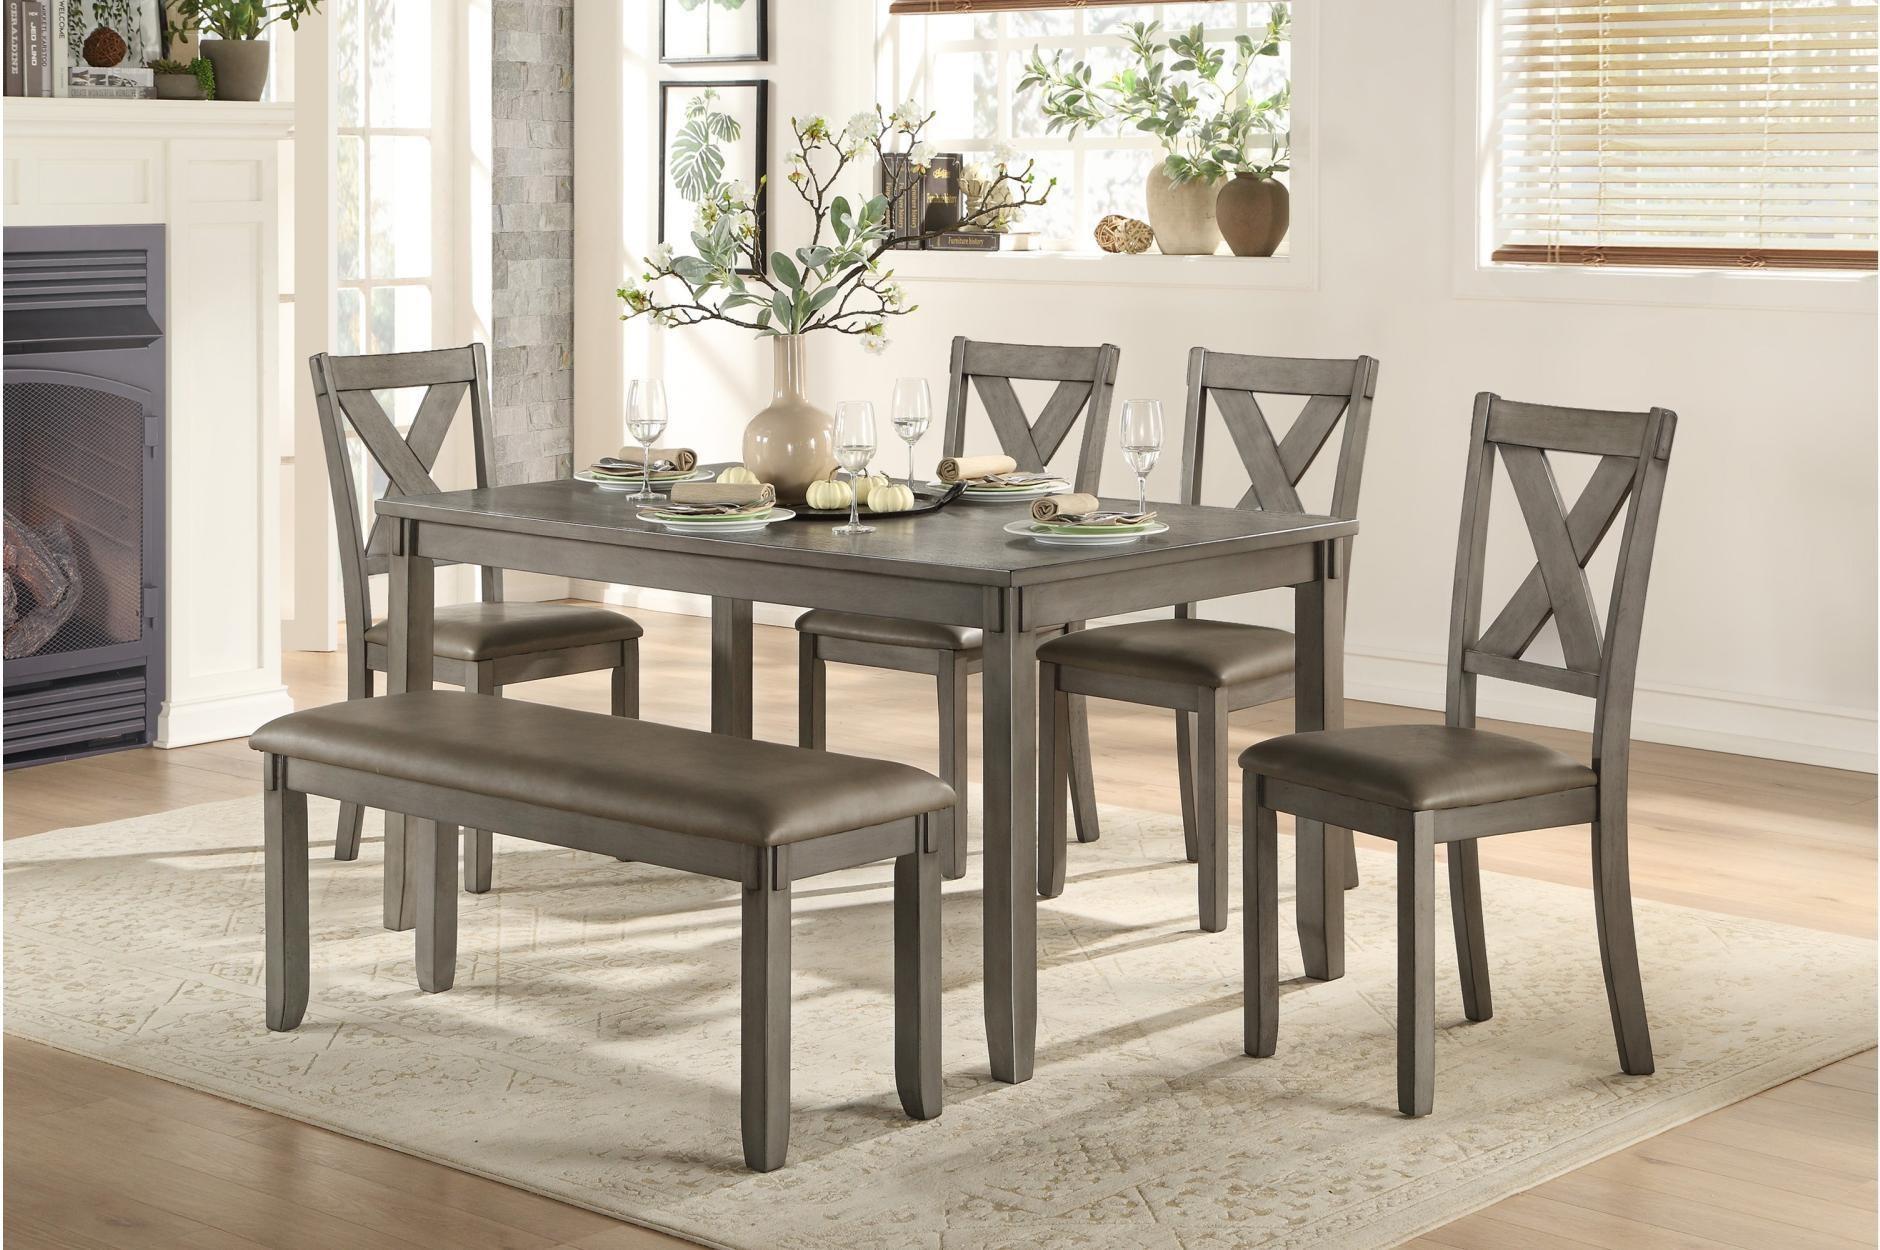 homelegance holders 5 piece dining set wfree bench